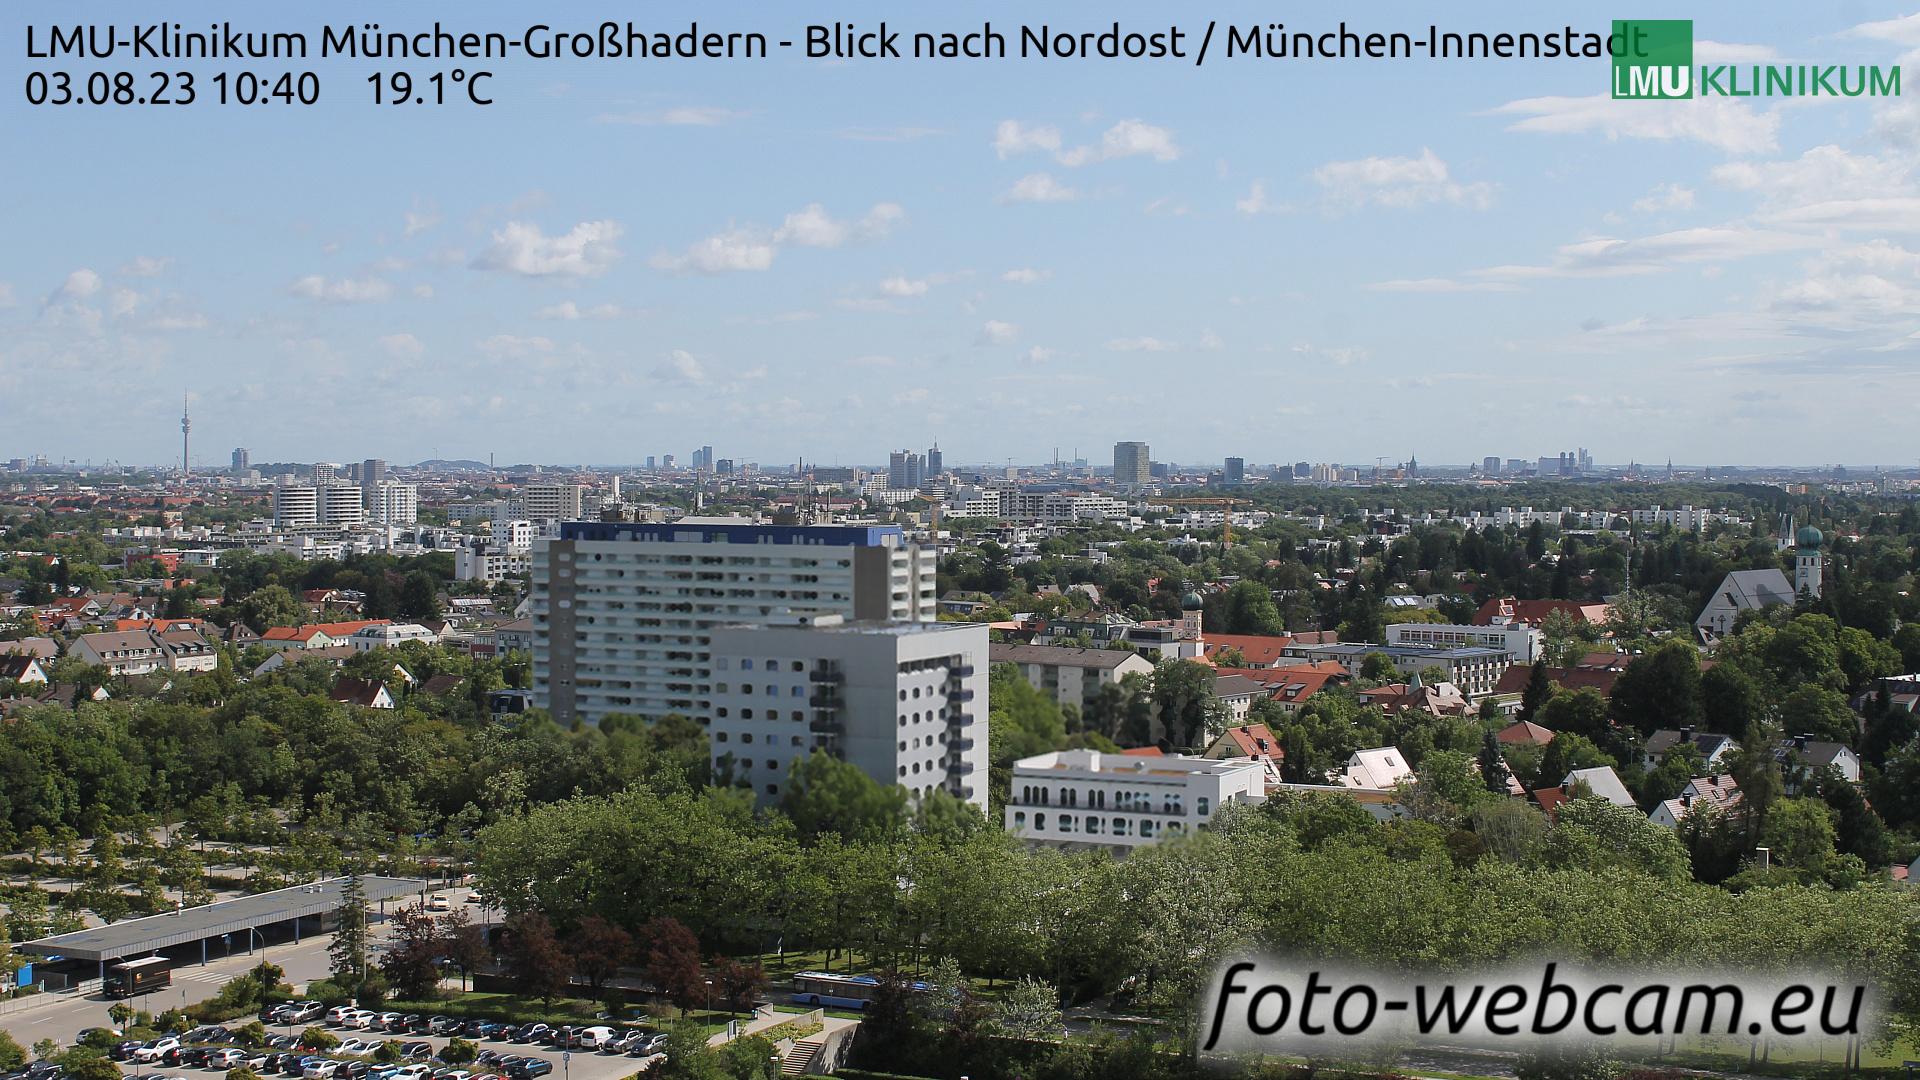 Munich Mon. 10:47